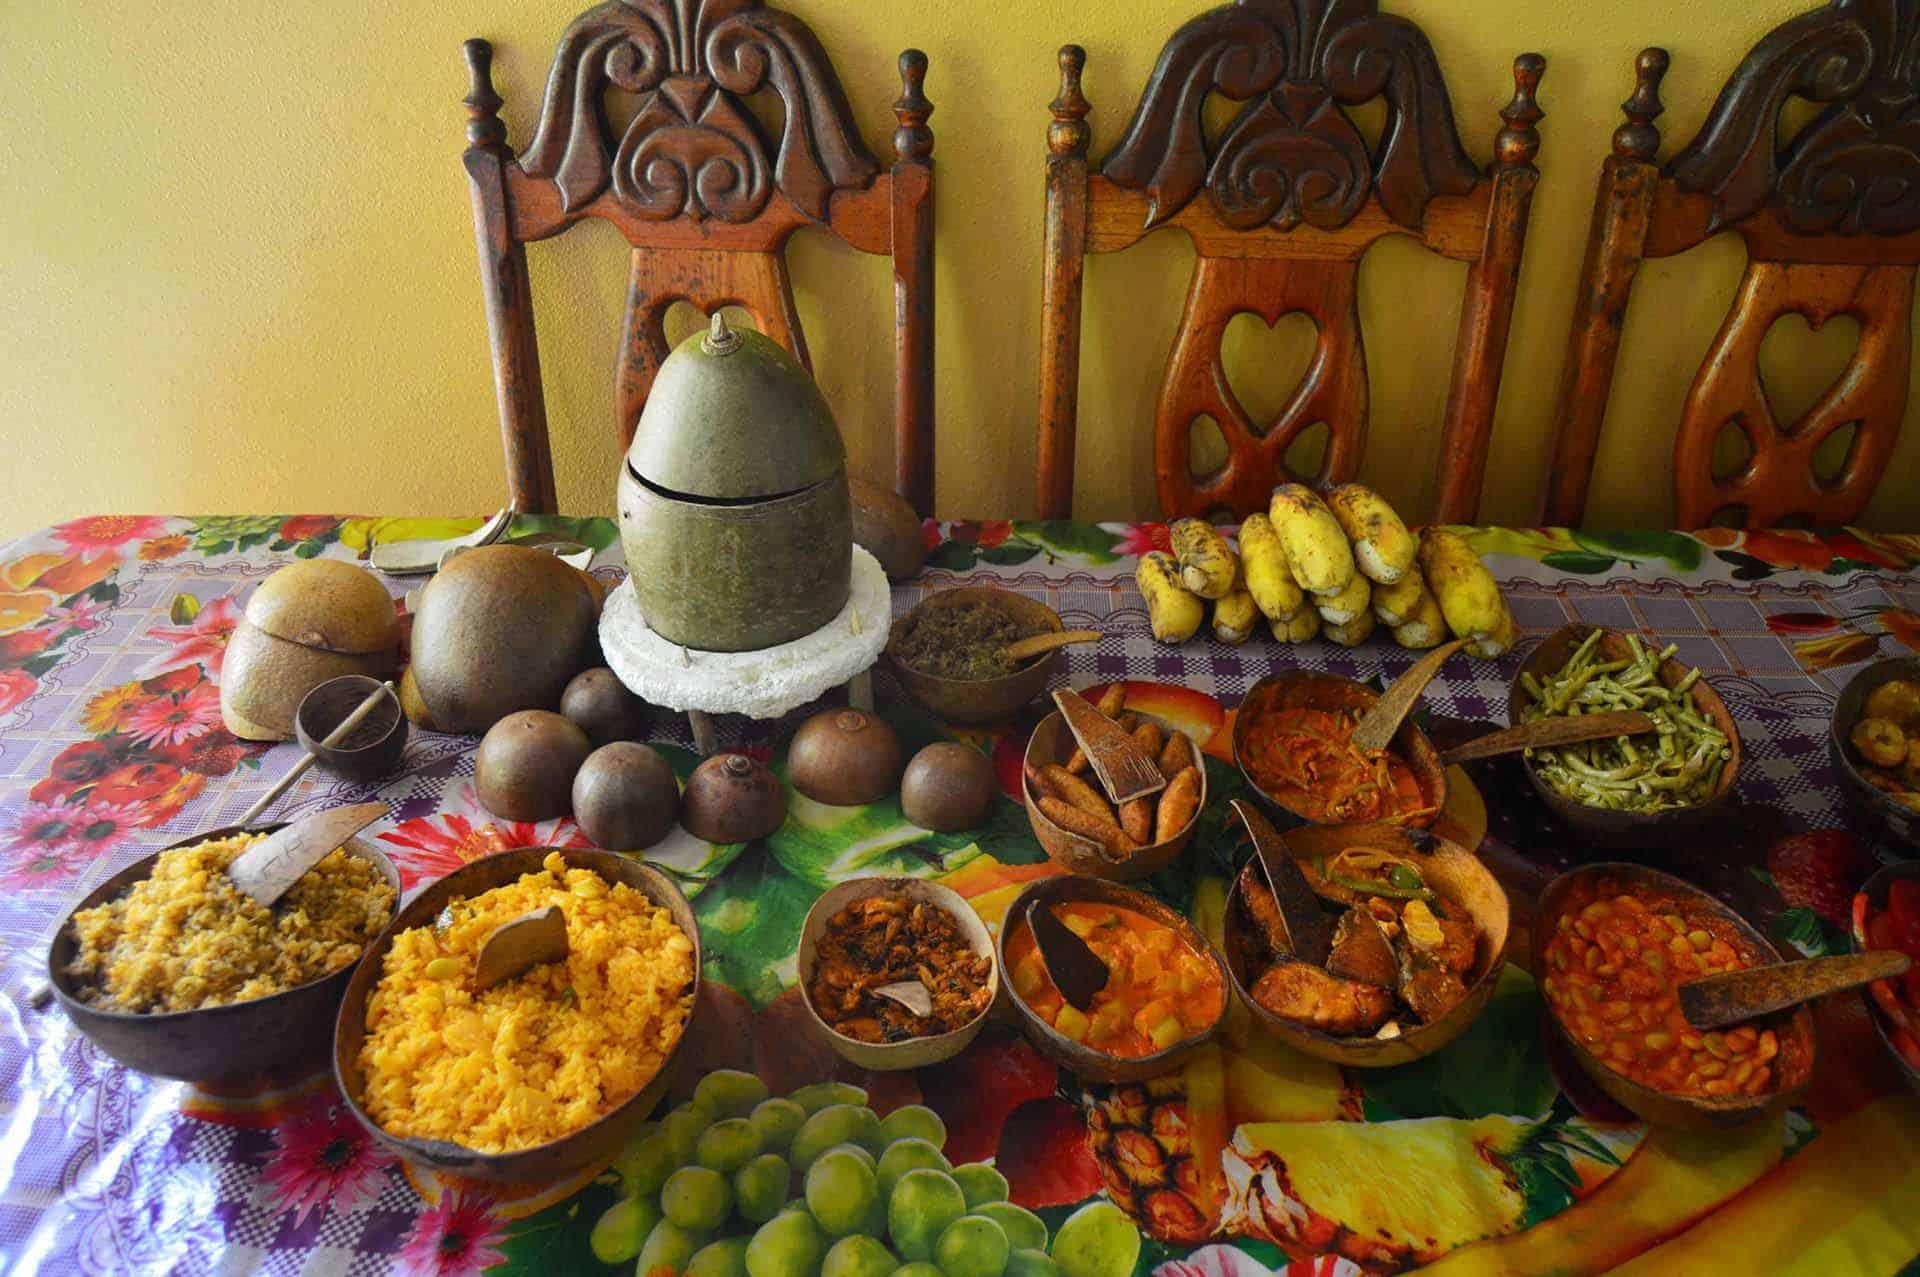 baracoa table nourriture repas cuba autrement